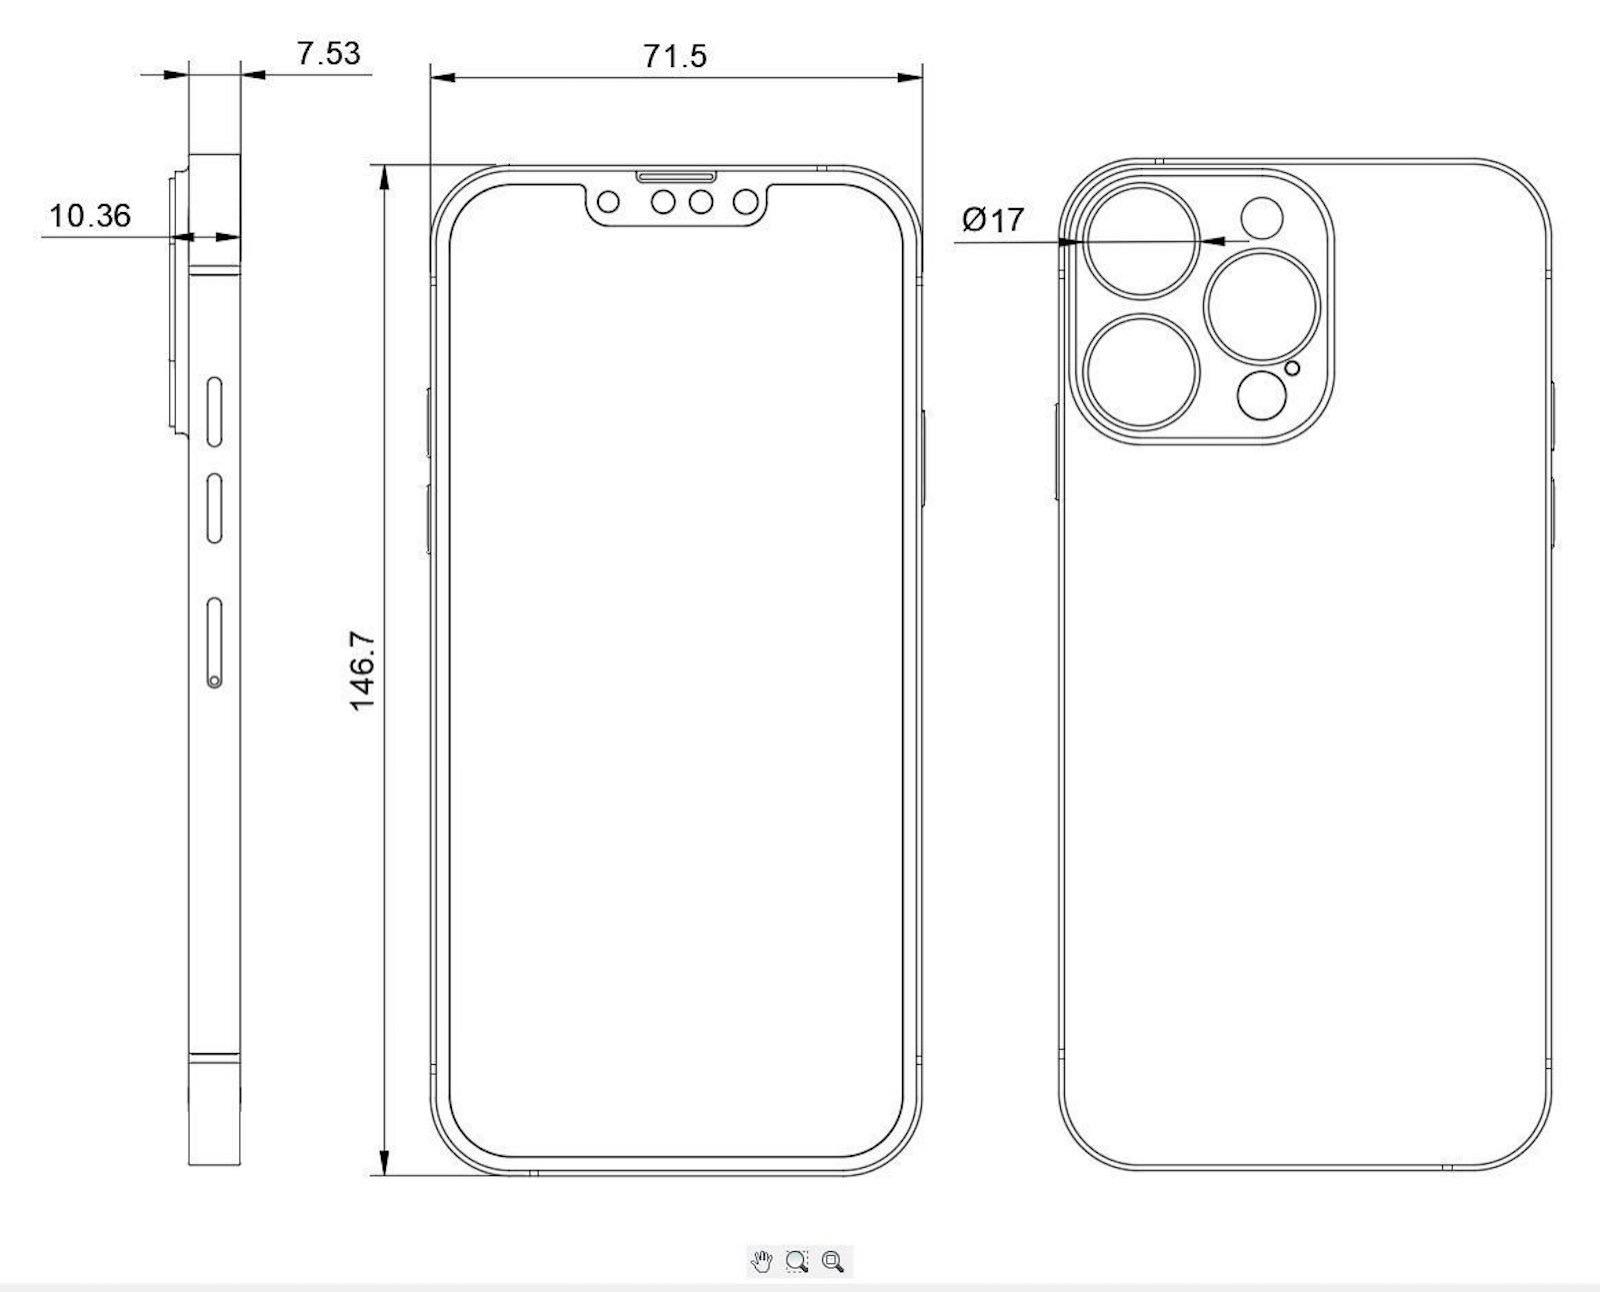 Iphone 13 pro schematics